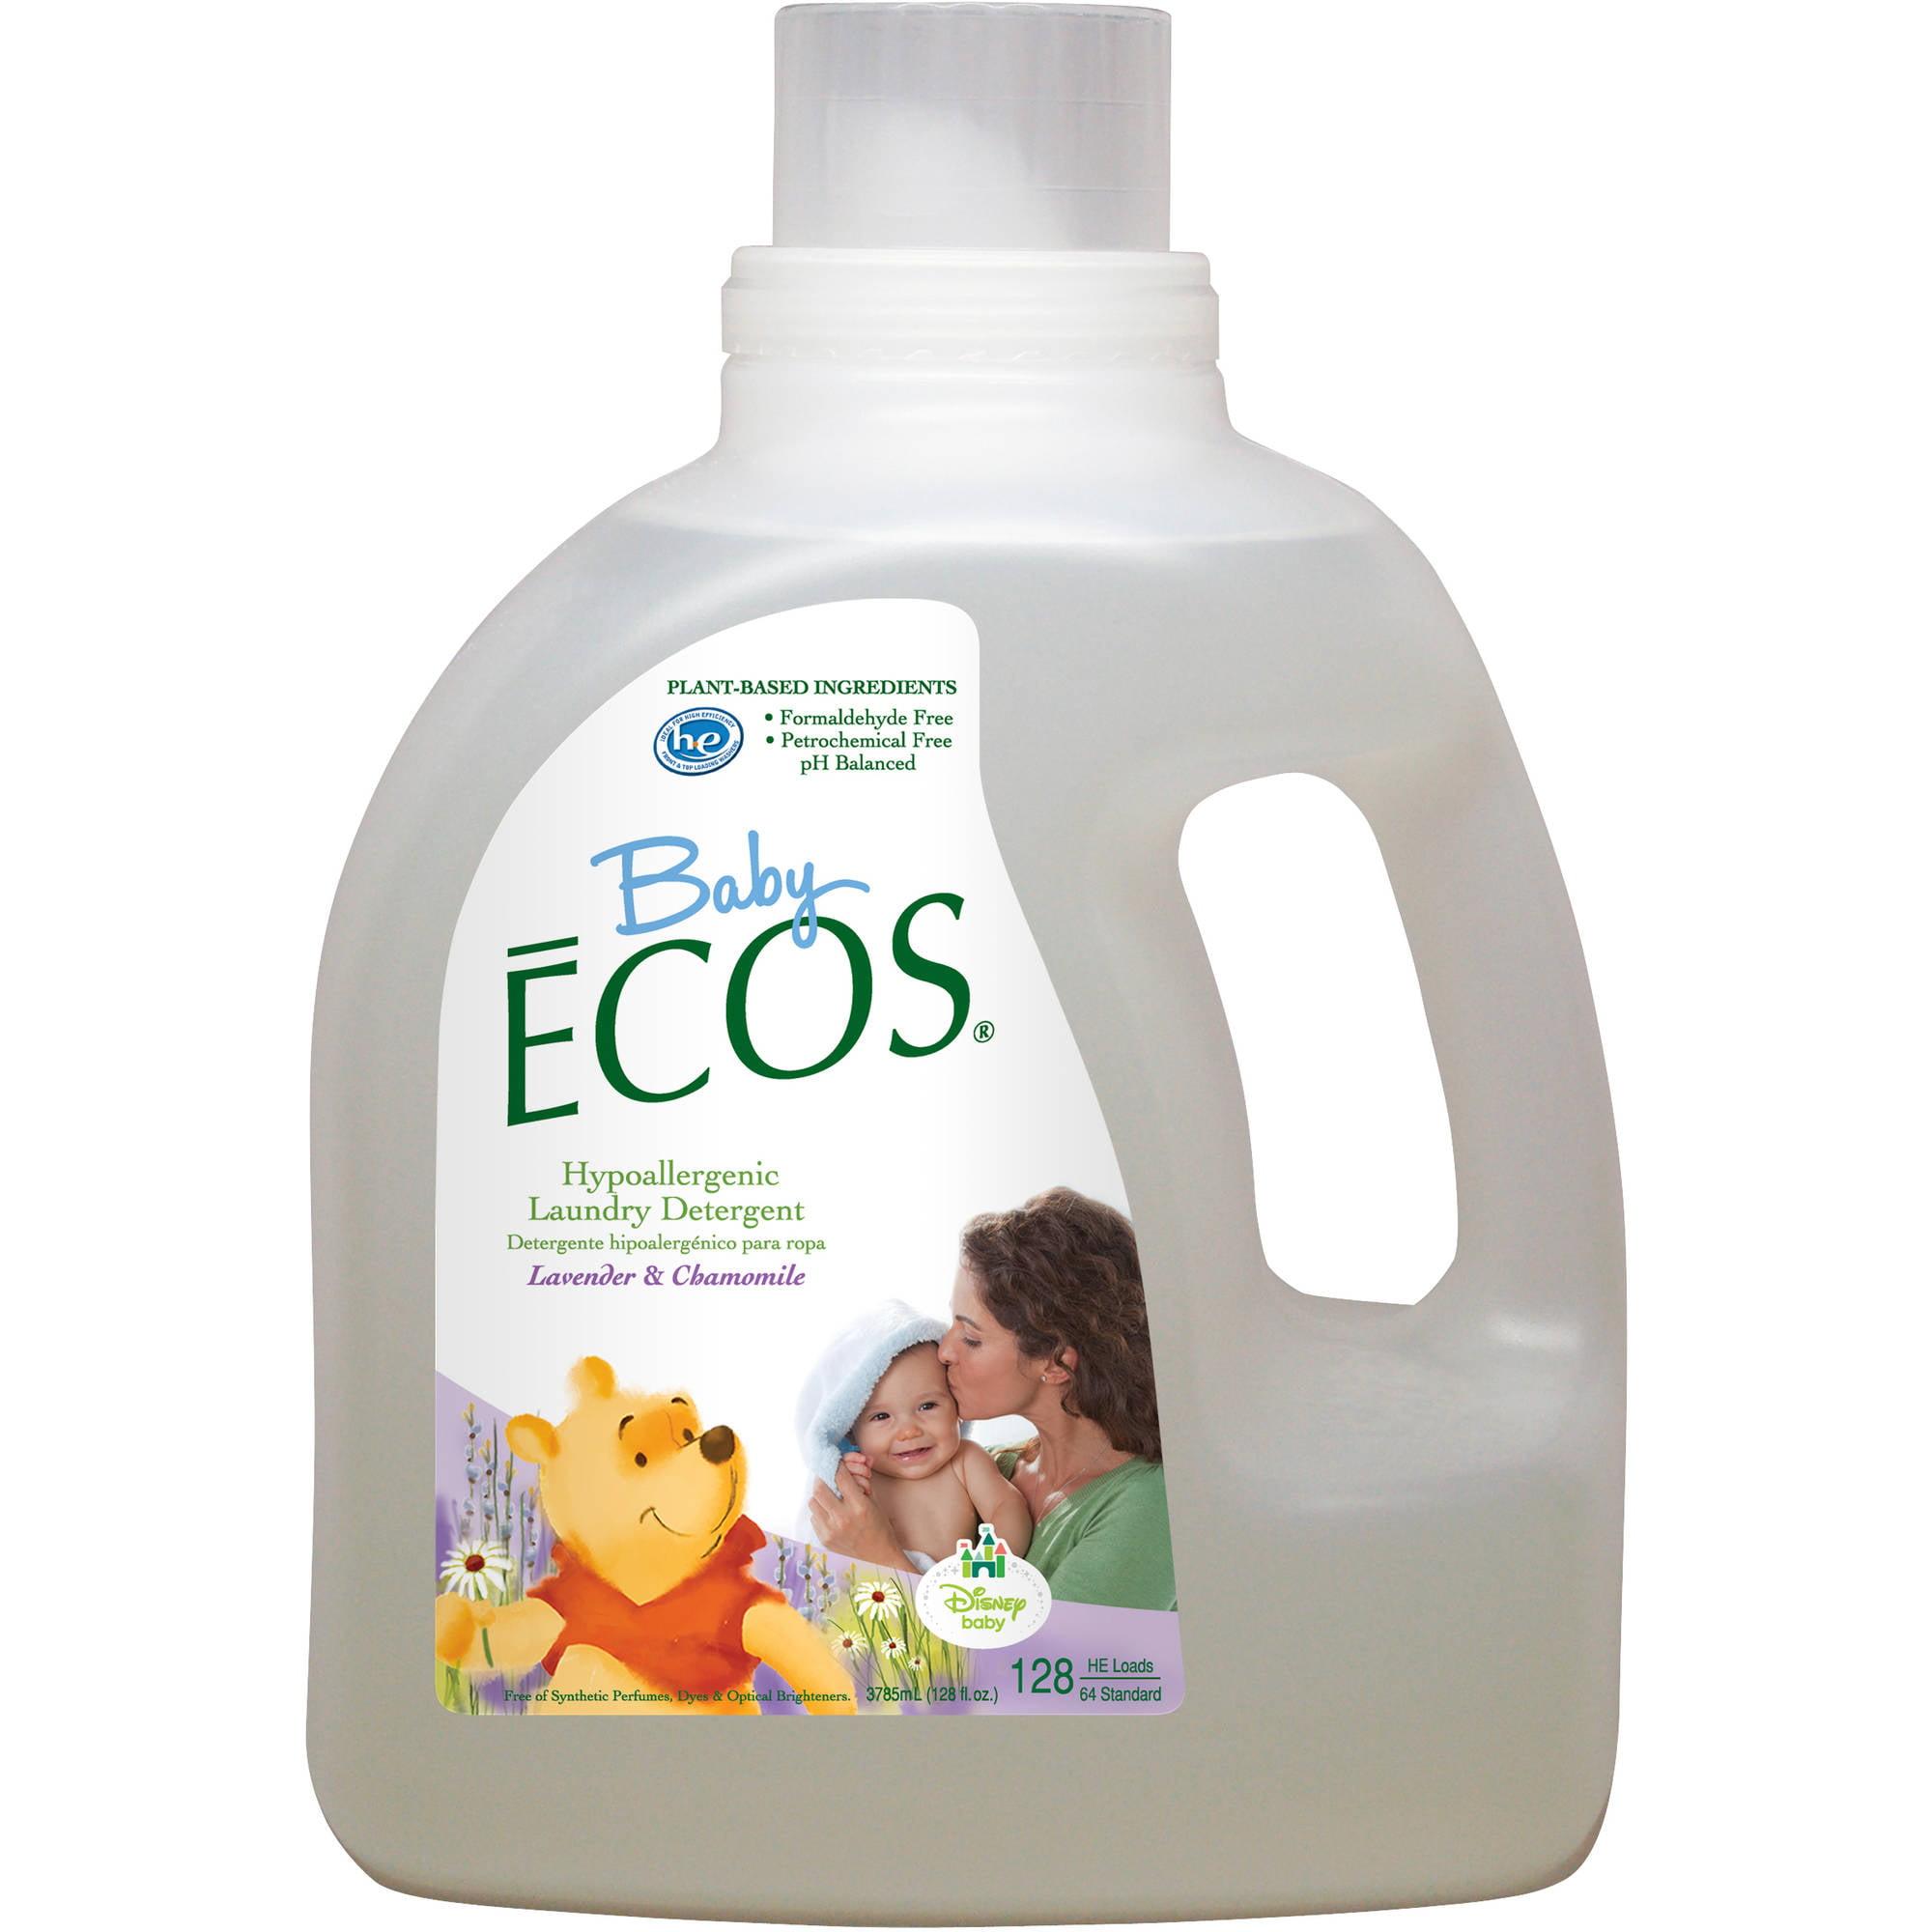 Disney Baby ECOS Lavender & Chamomile Laundry Detergent, 128 oz